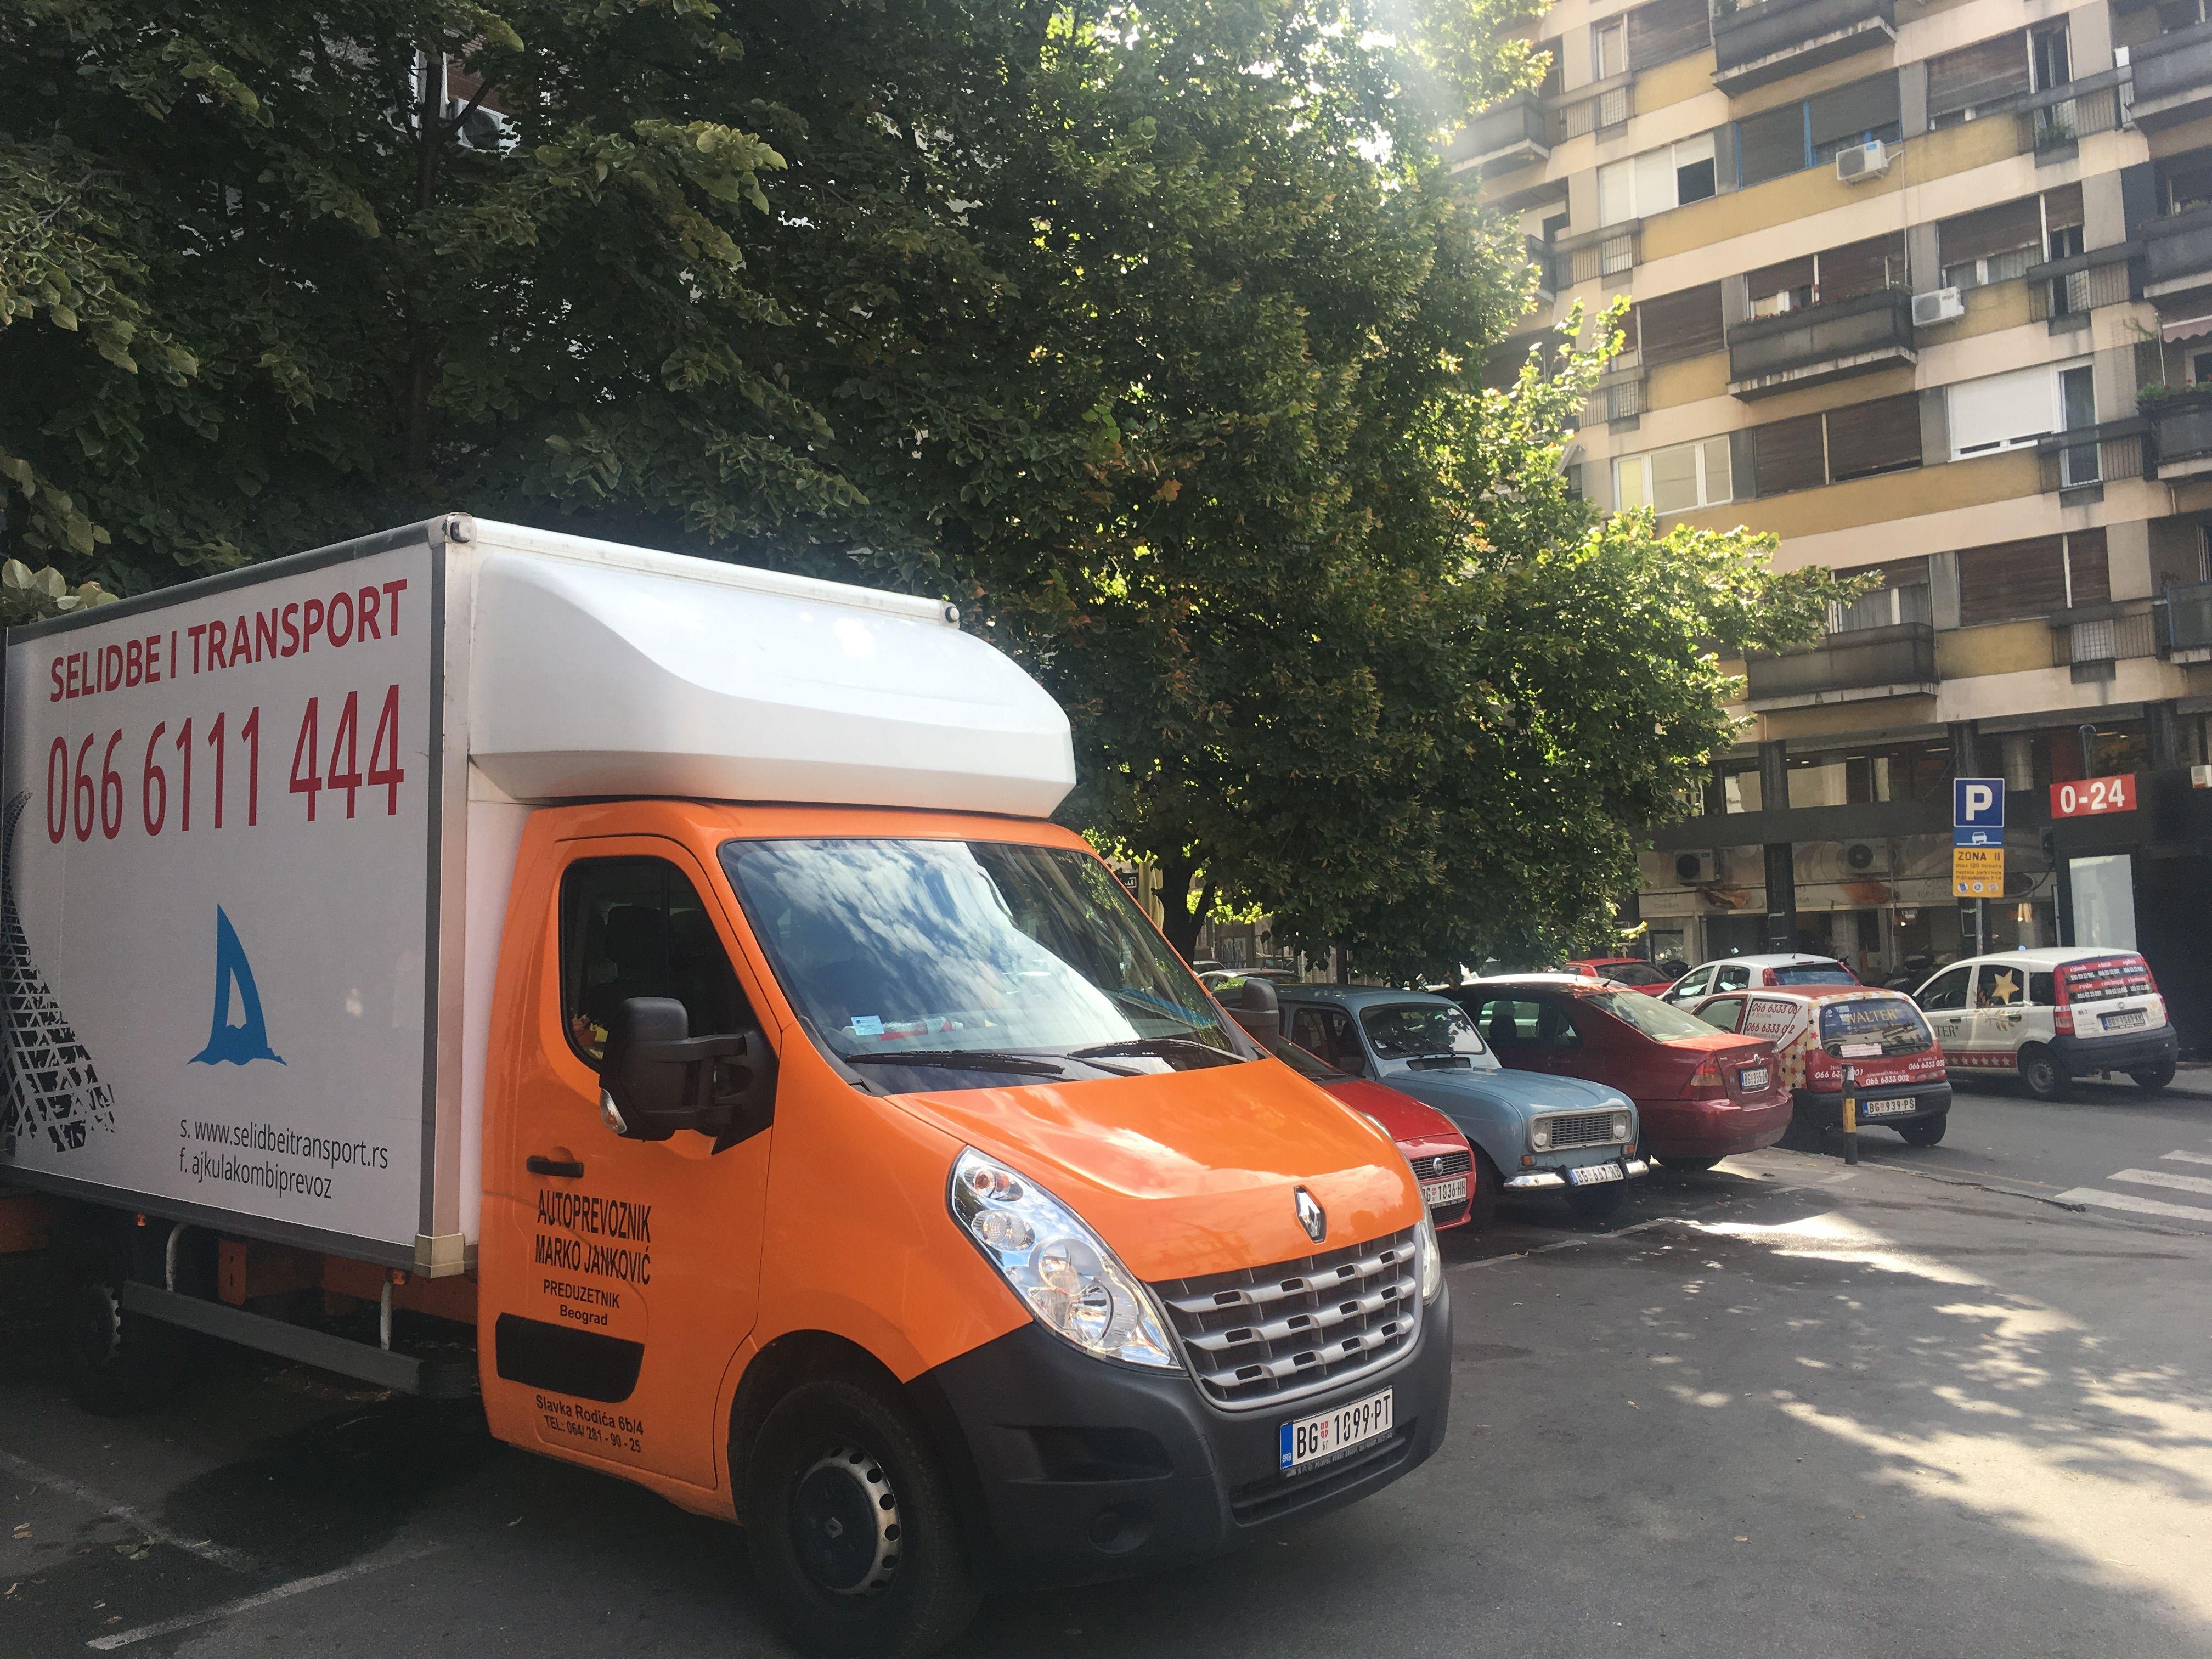 Kamion za selidbe i trasnport